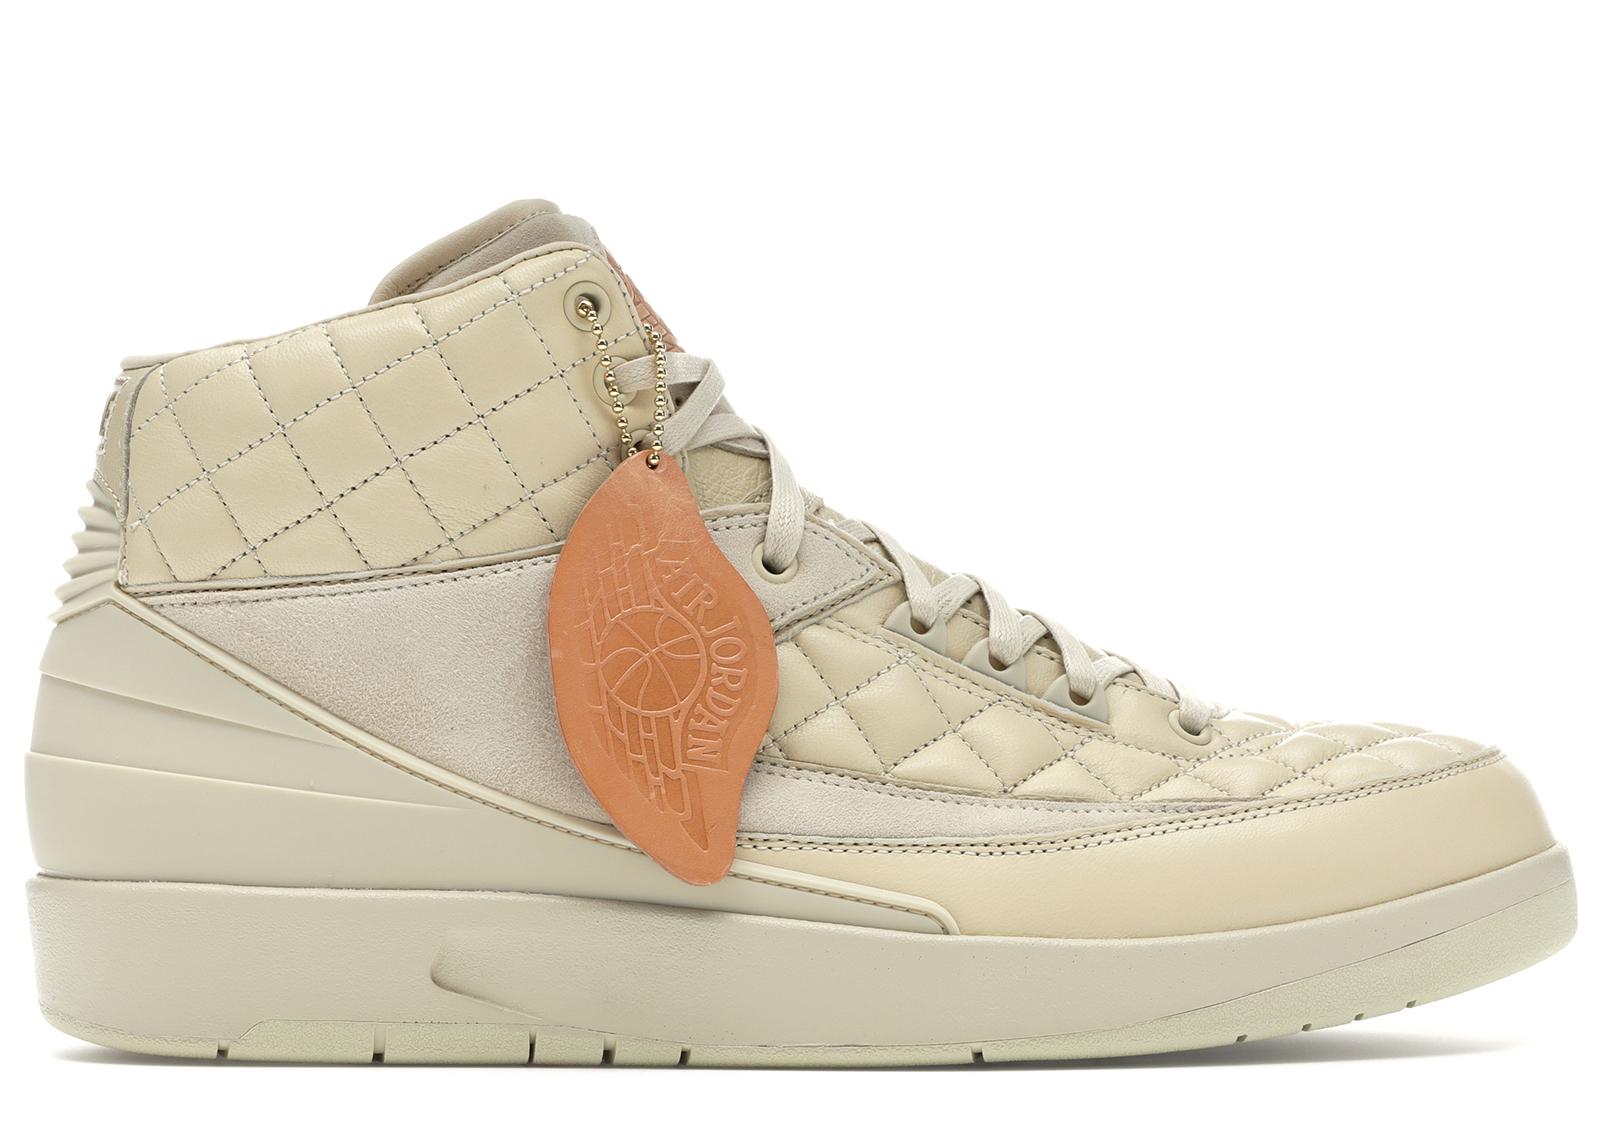 Jordan Deadstock Sneakers Buy 2 Air Shoesamp; W9DHYEeIb2